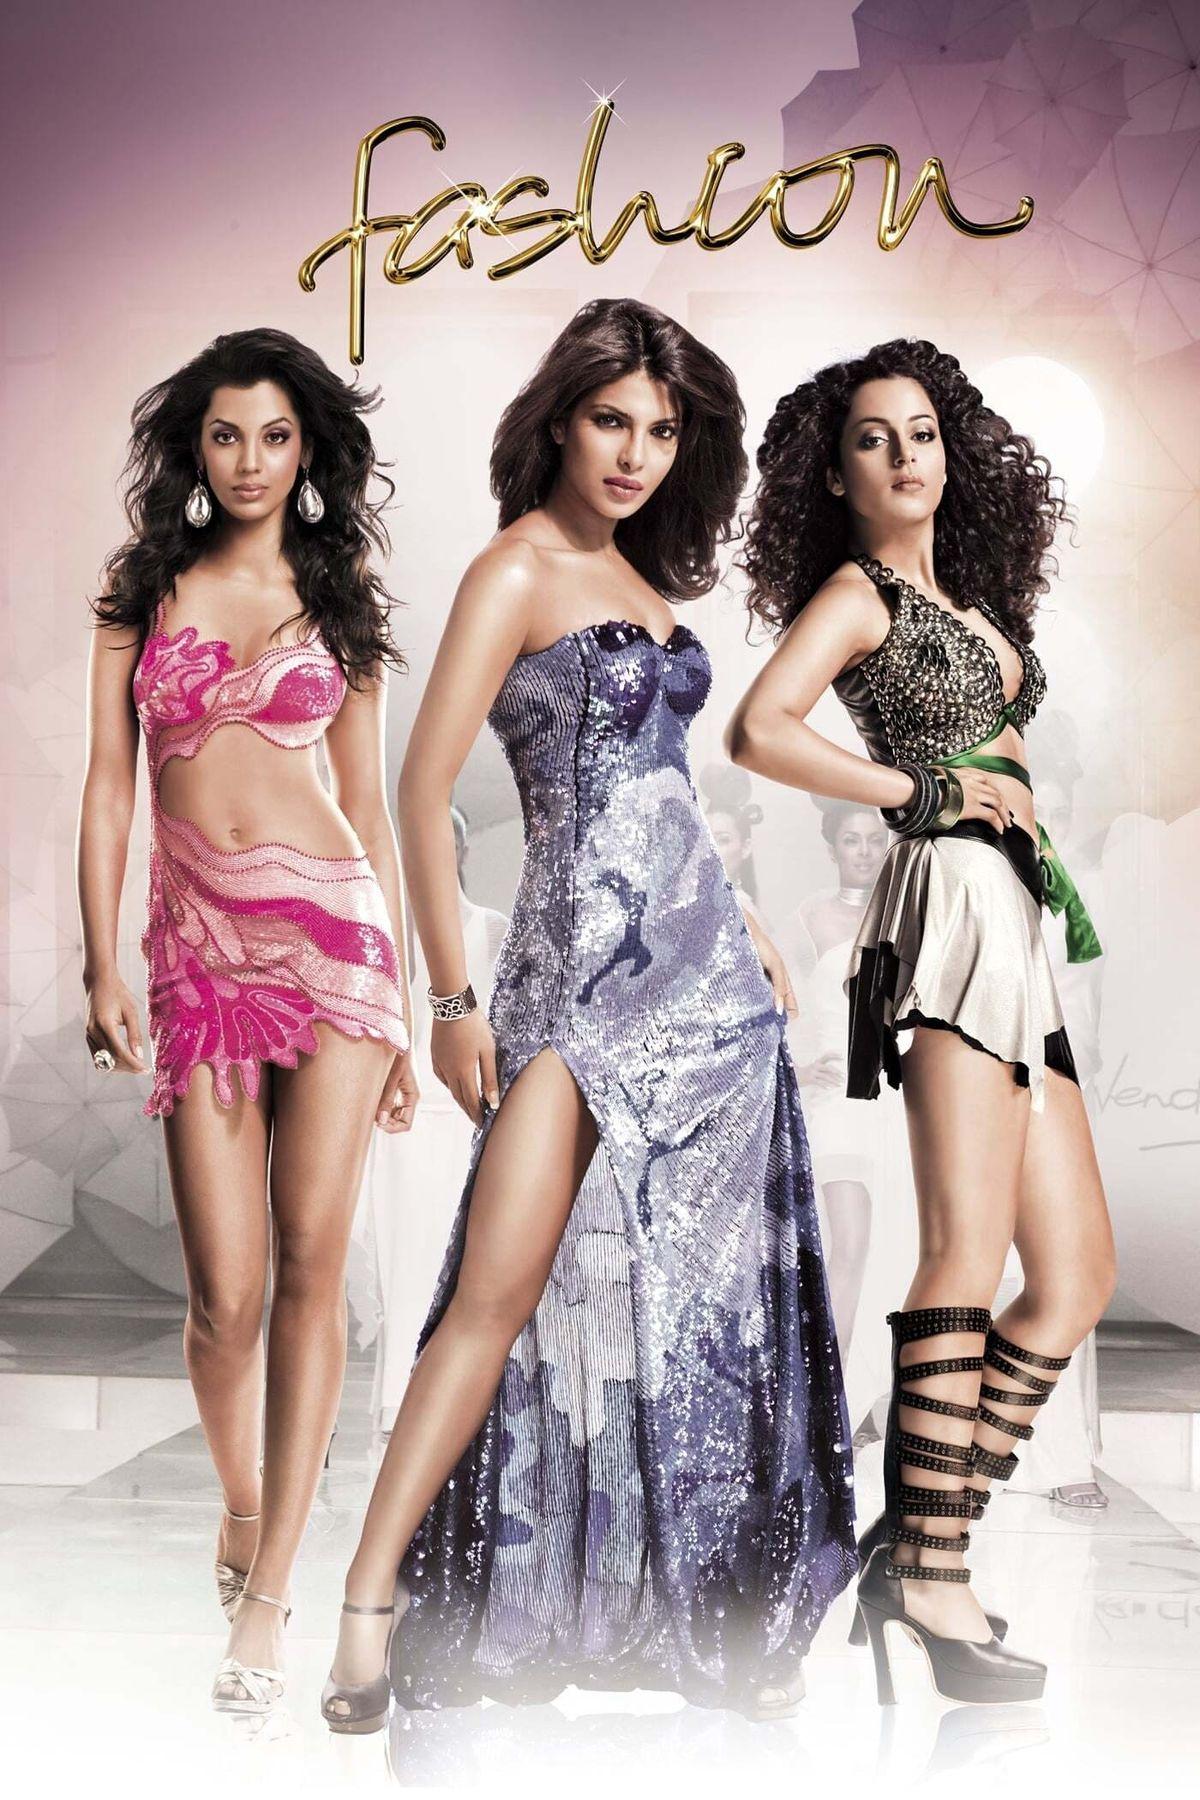 Manish Malhotra Best Movies, TV Shows and Web Series List